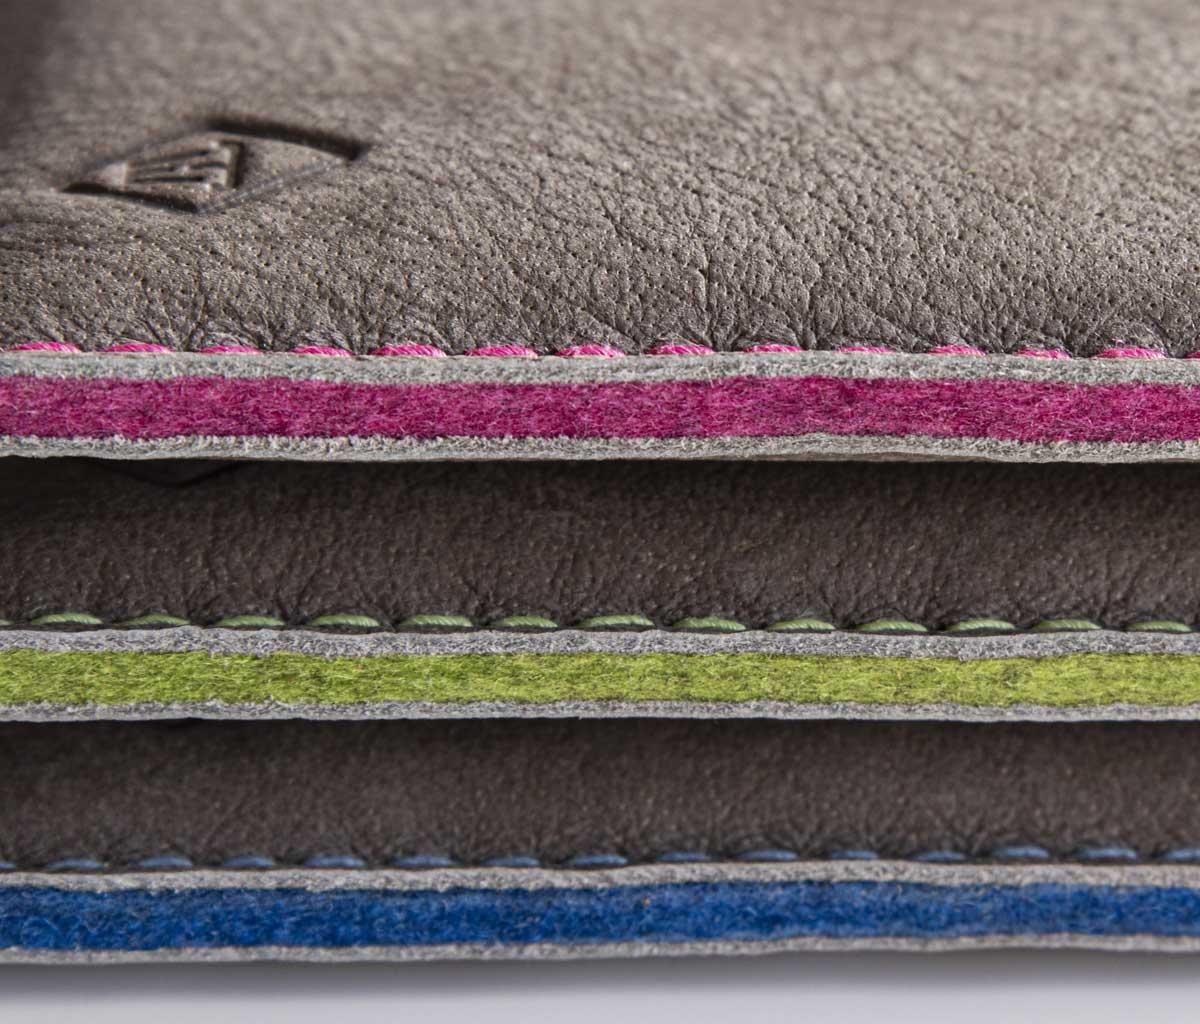 iPhone 13 12 11 Pro Max mini SE leather case with colorful felt lining SCHUTZPATRON